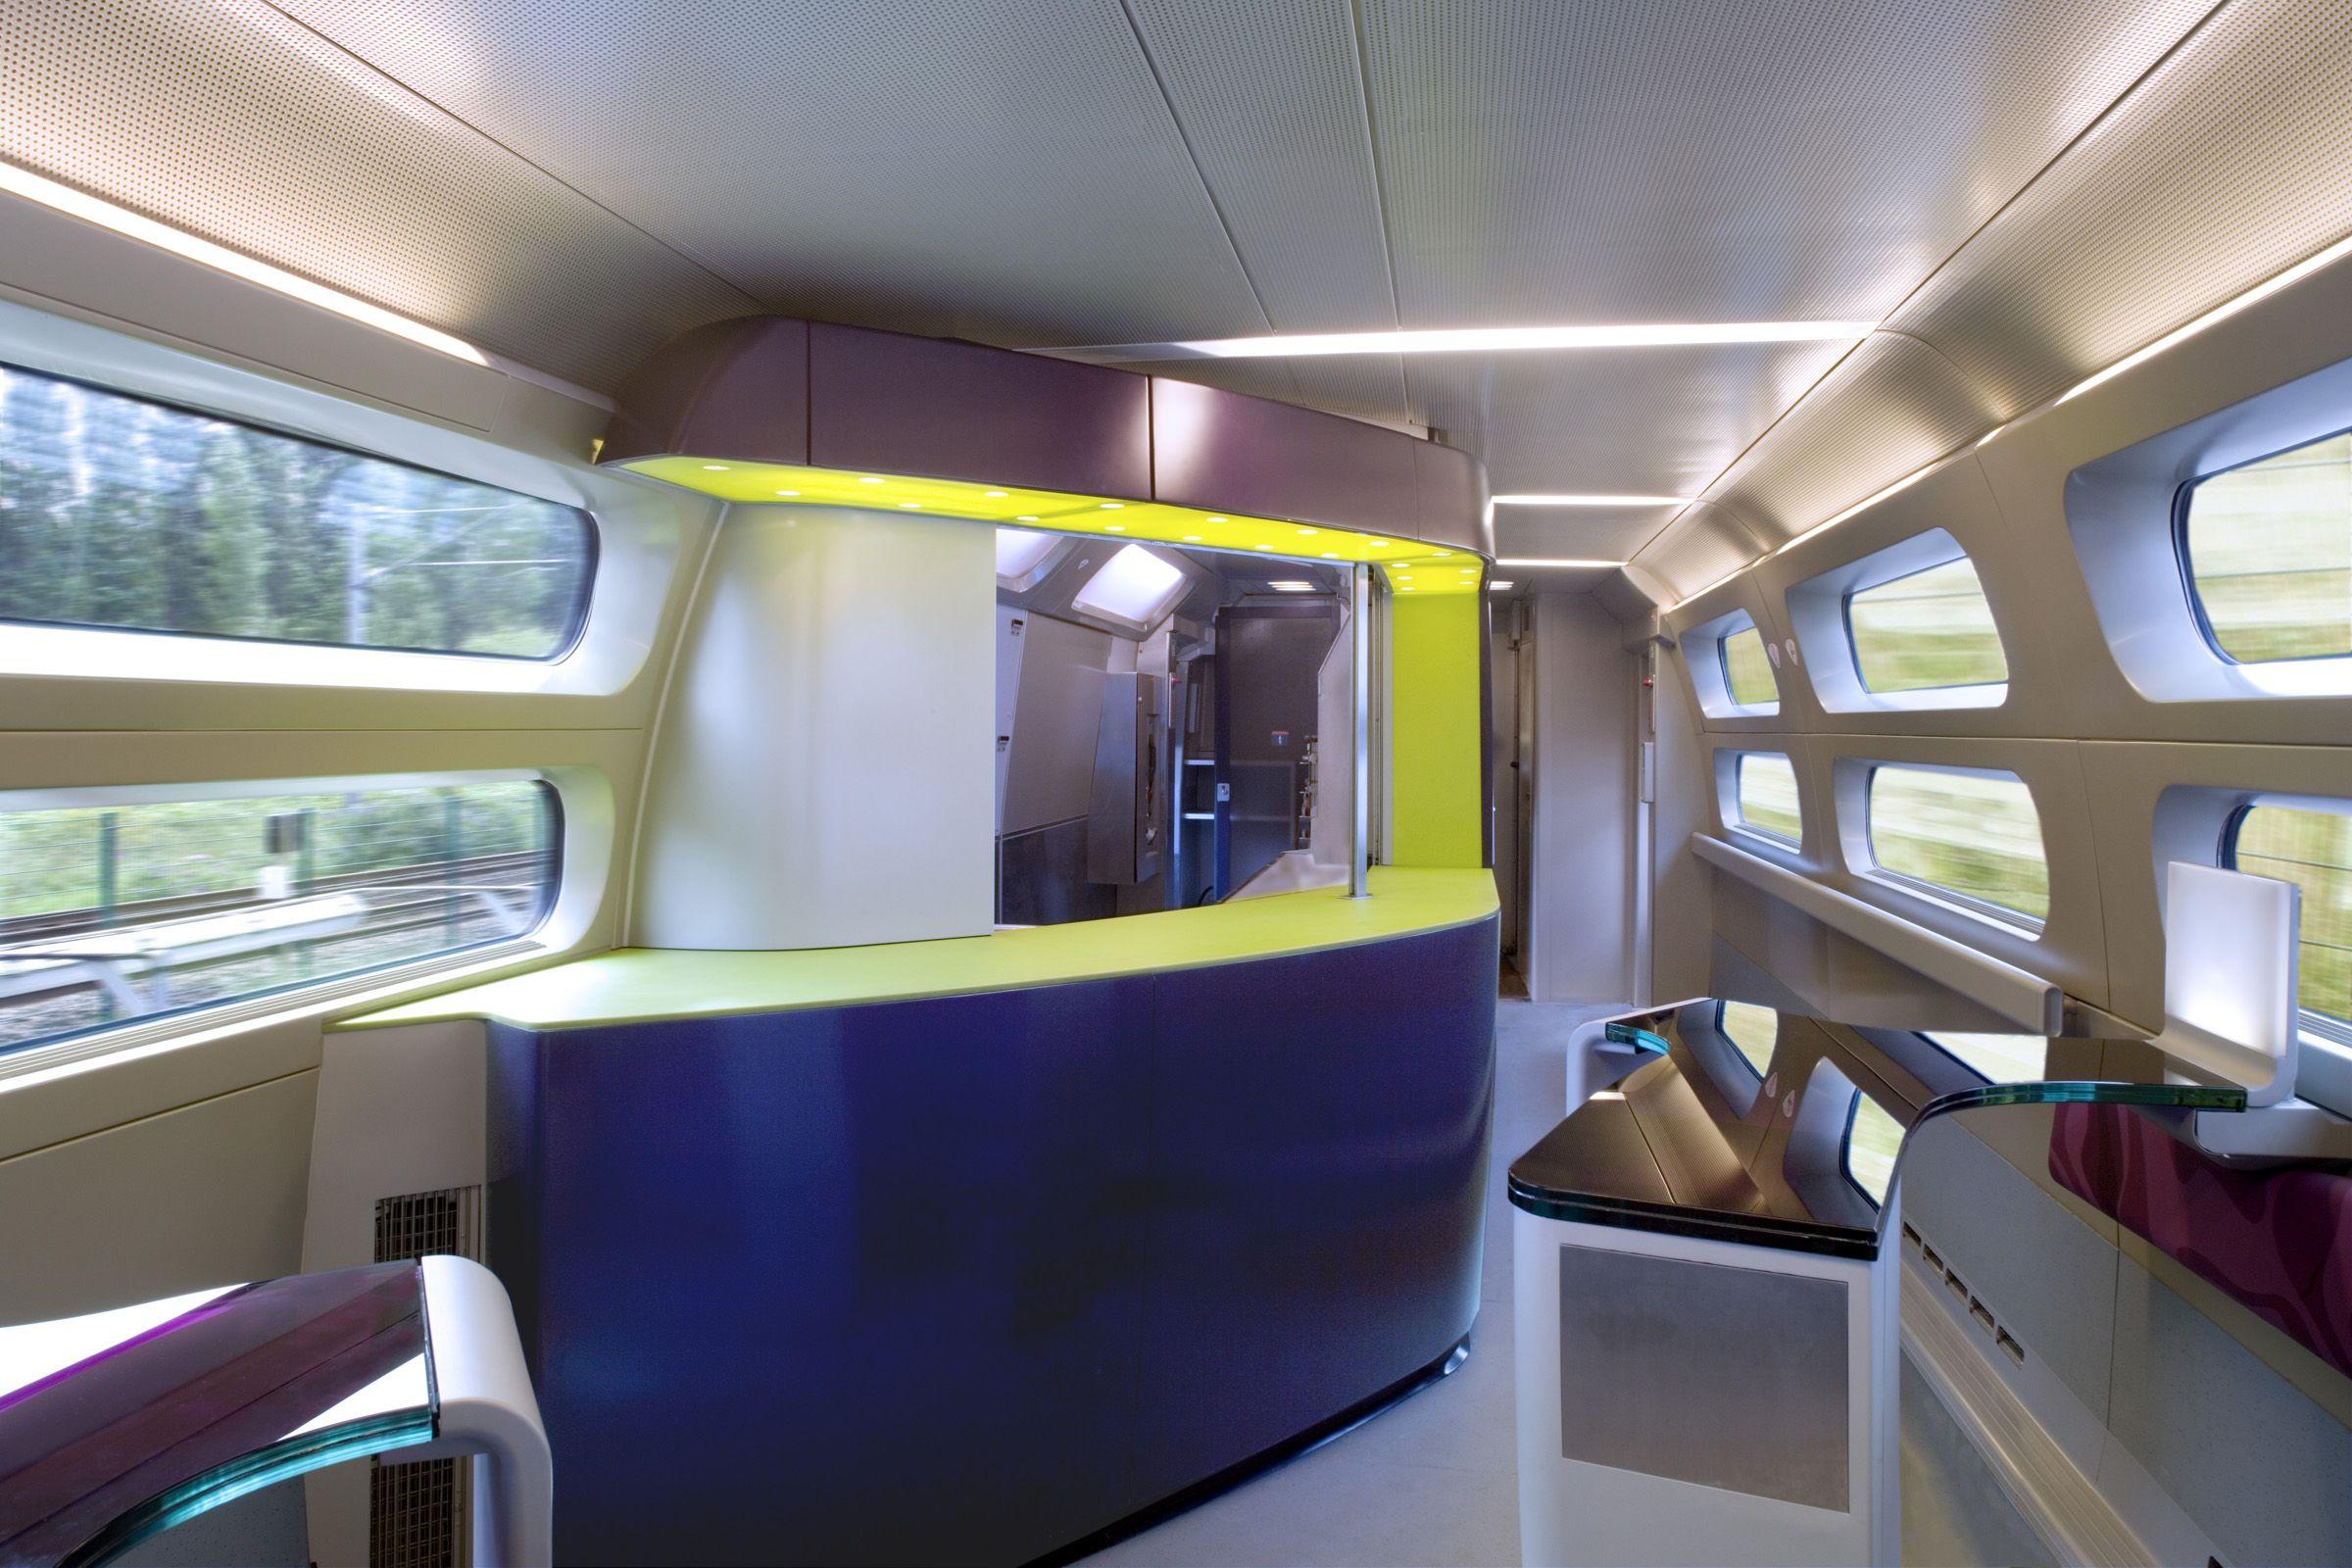 Bar Tgv Car.... | My Things | Pinterest | High speed rail and Speed rail